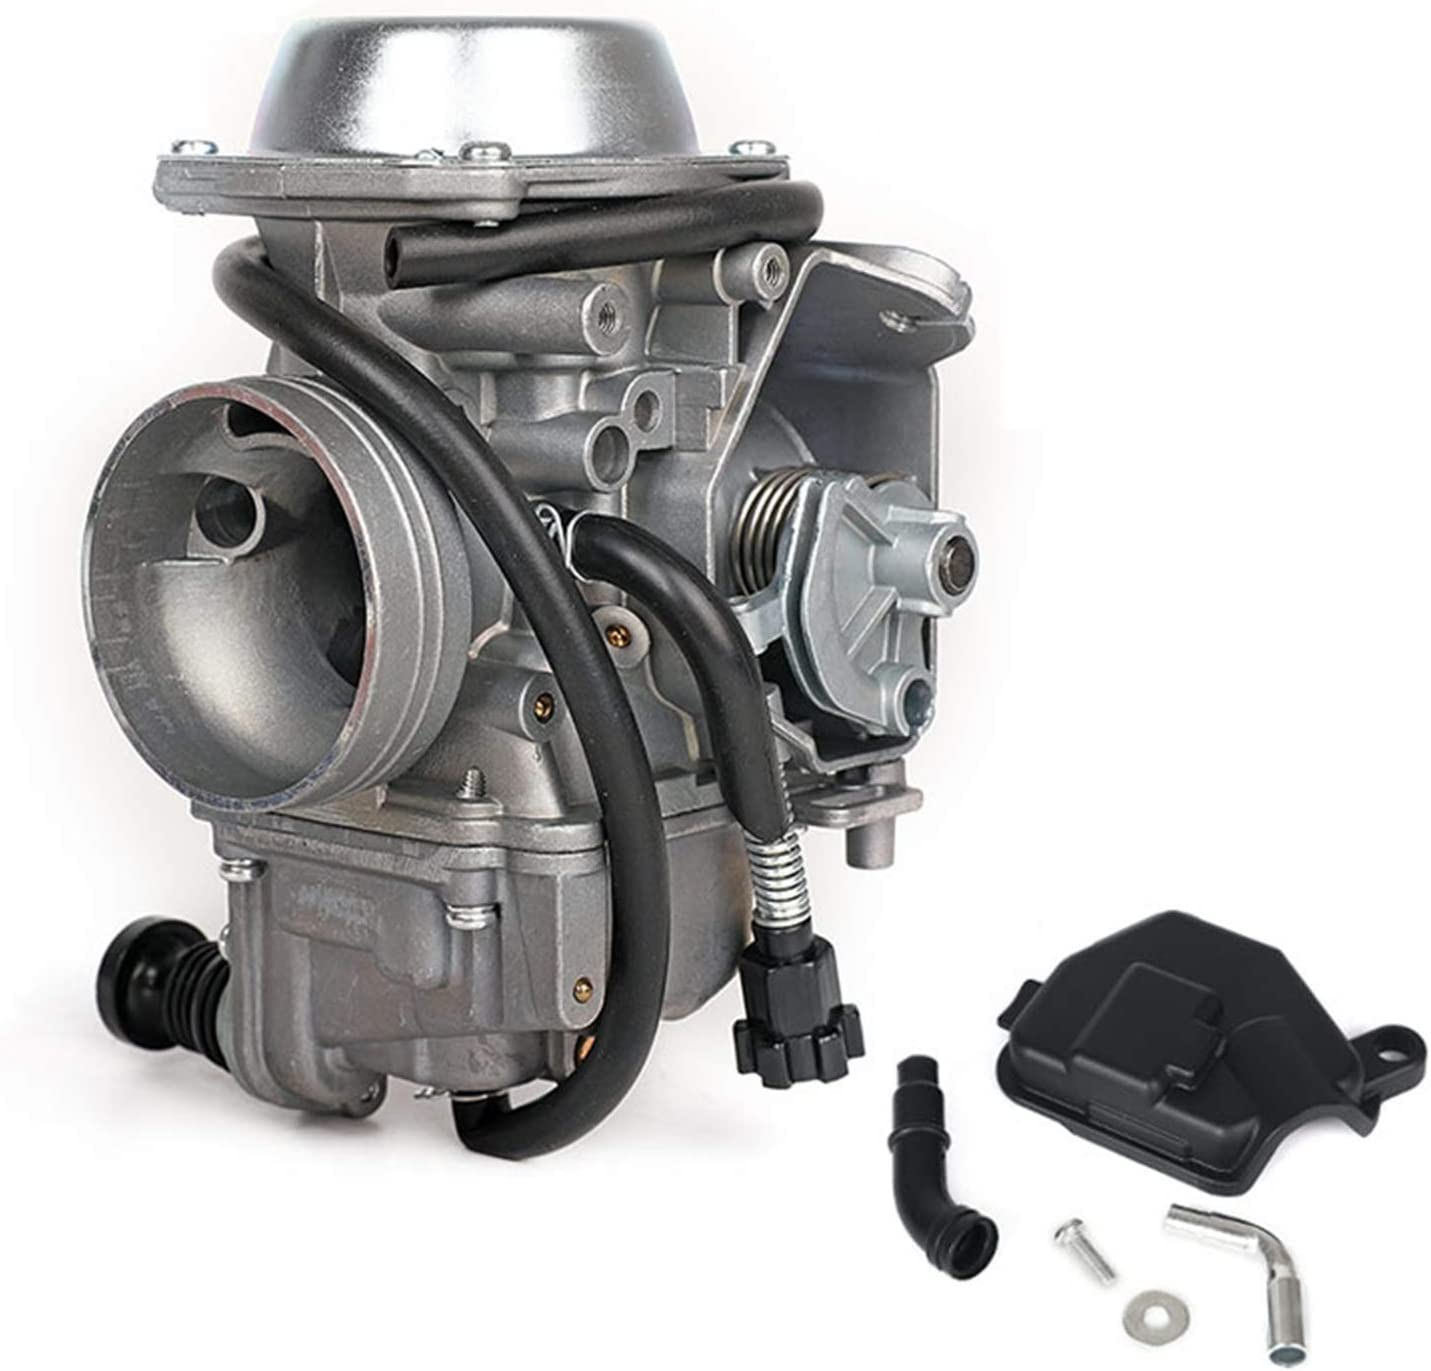 Replacement Motorcycle PD32J Special sale item 32MM Carburetor F Max 59% OFF Fit ATV Quad Carb